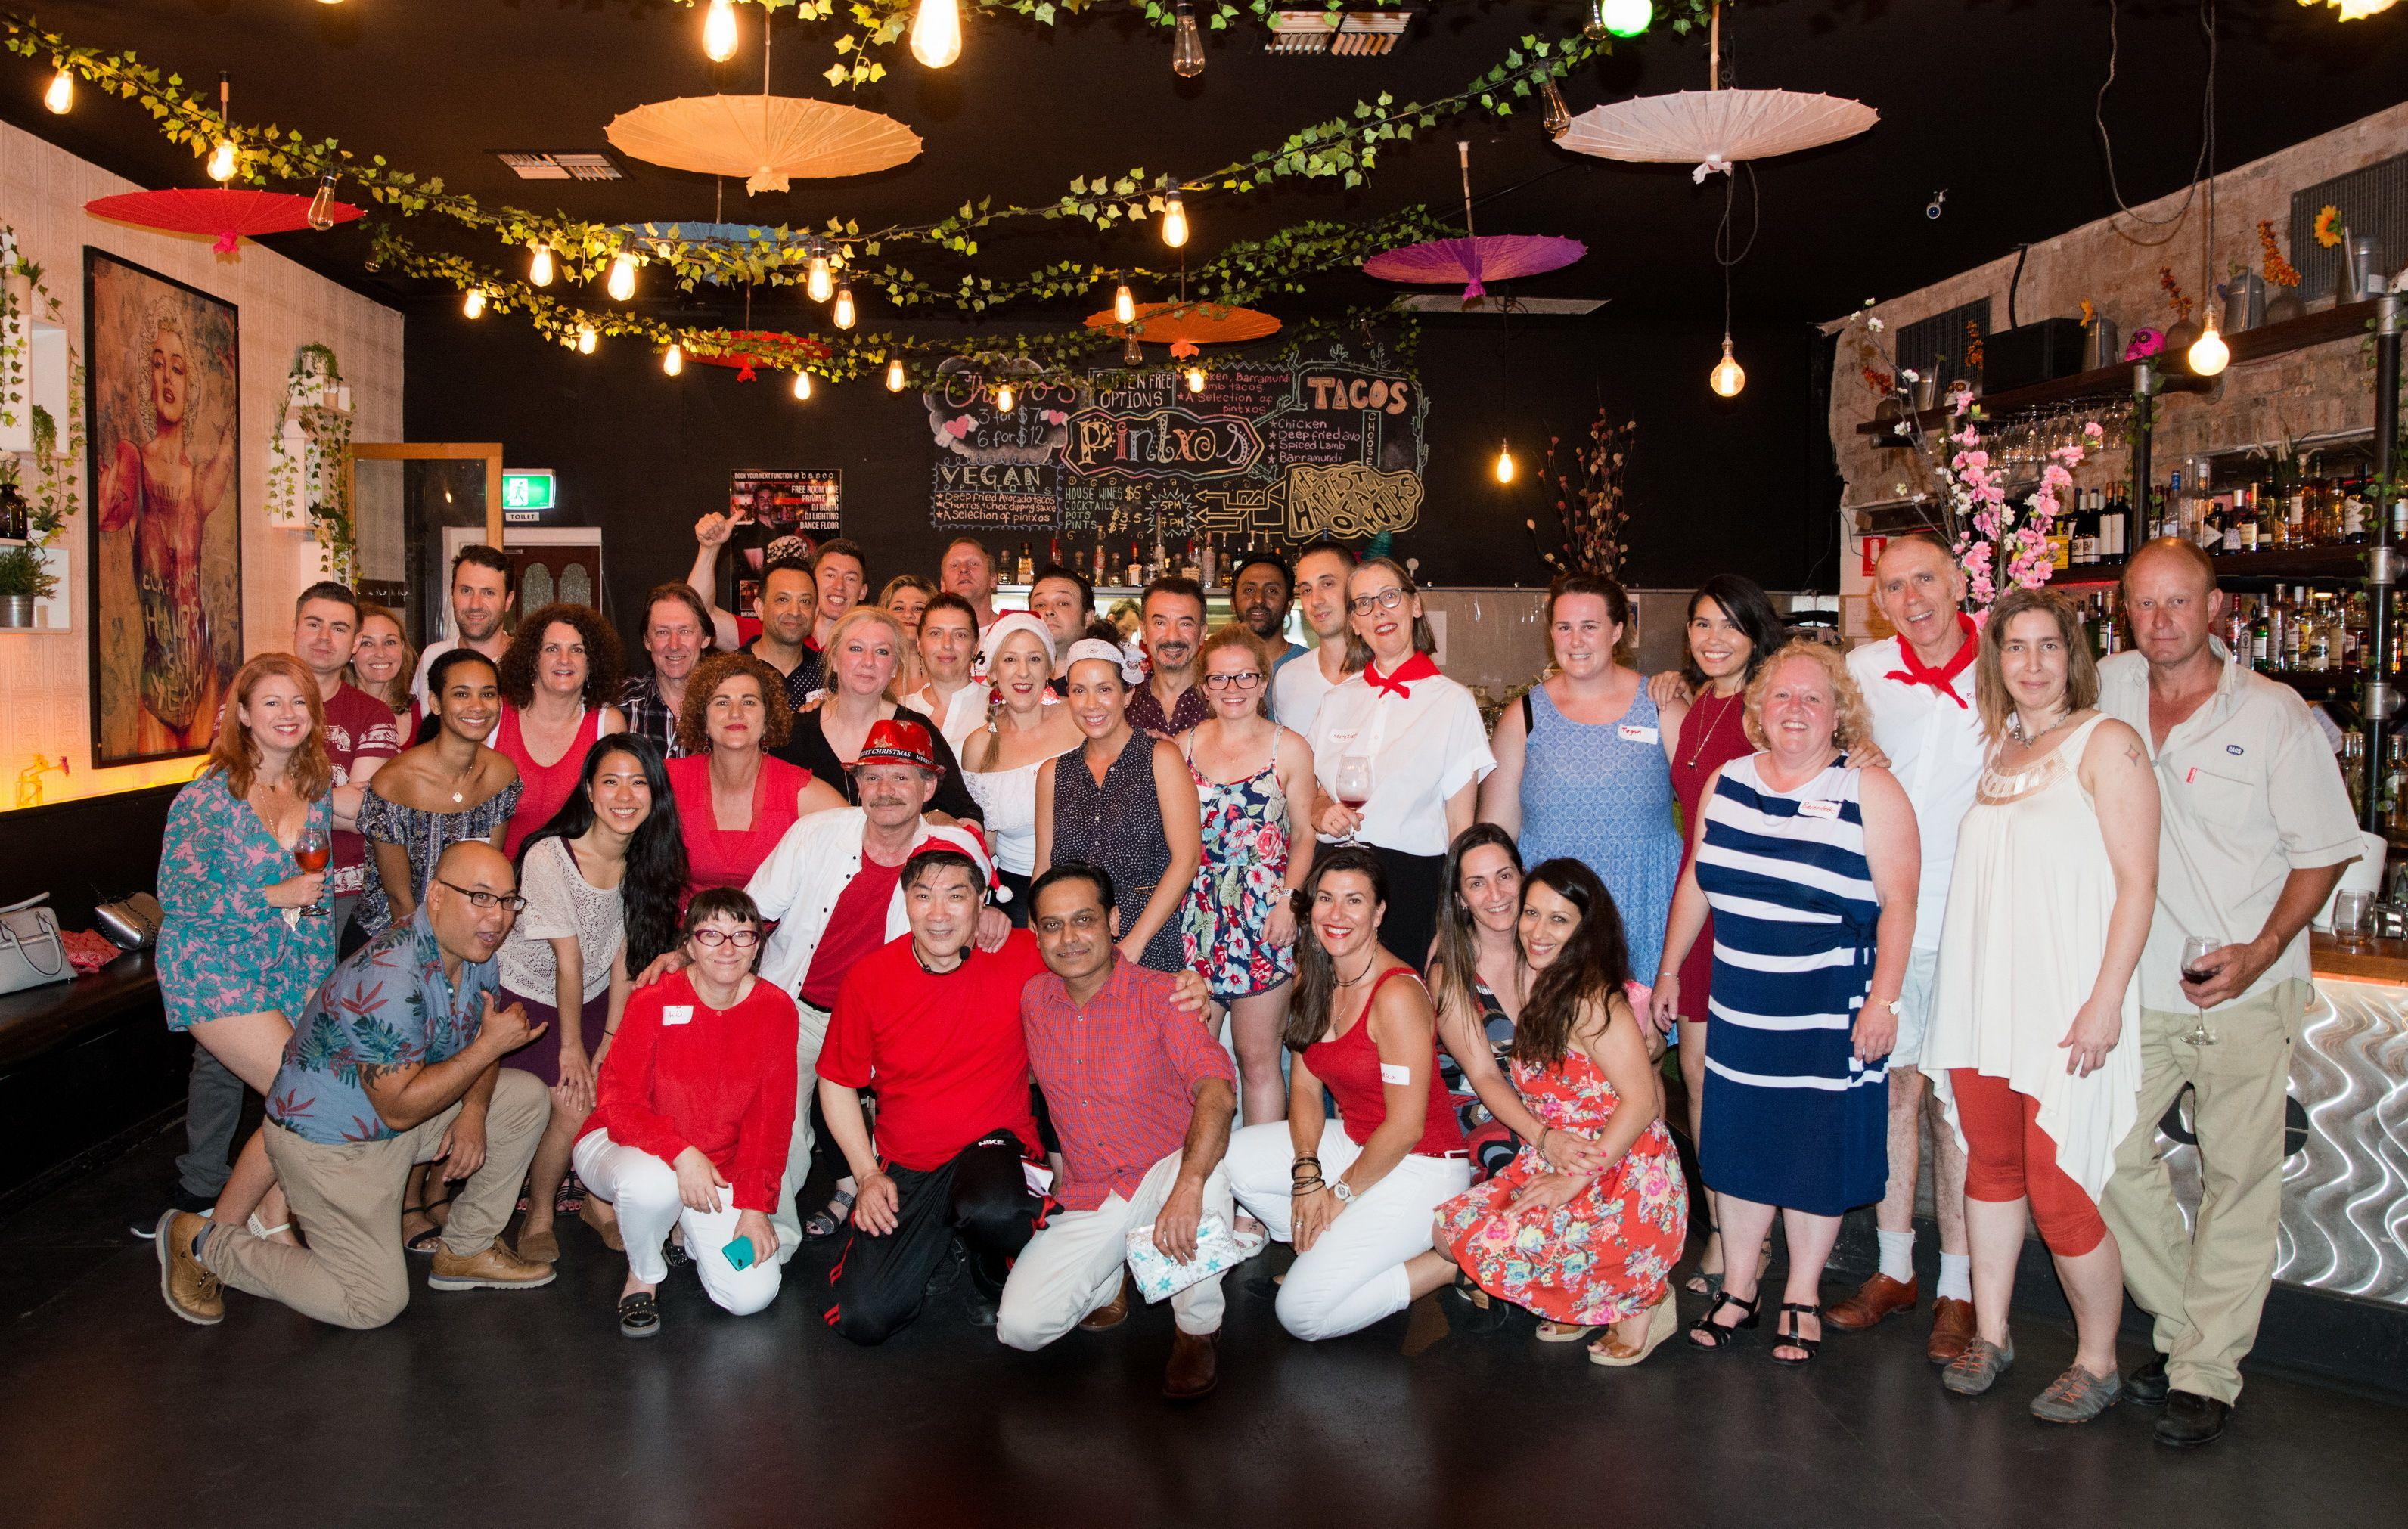 BRUNSWICK - Free Salsa Class, Salsa Classes & Social Dancing